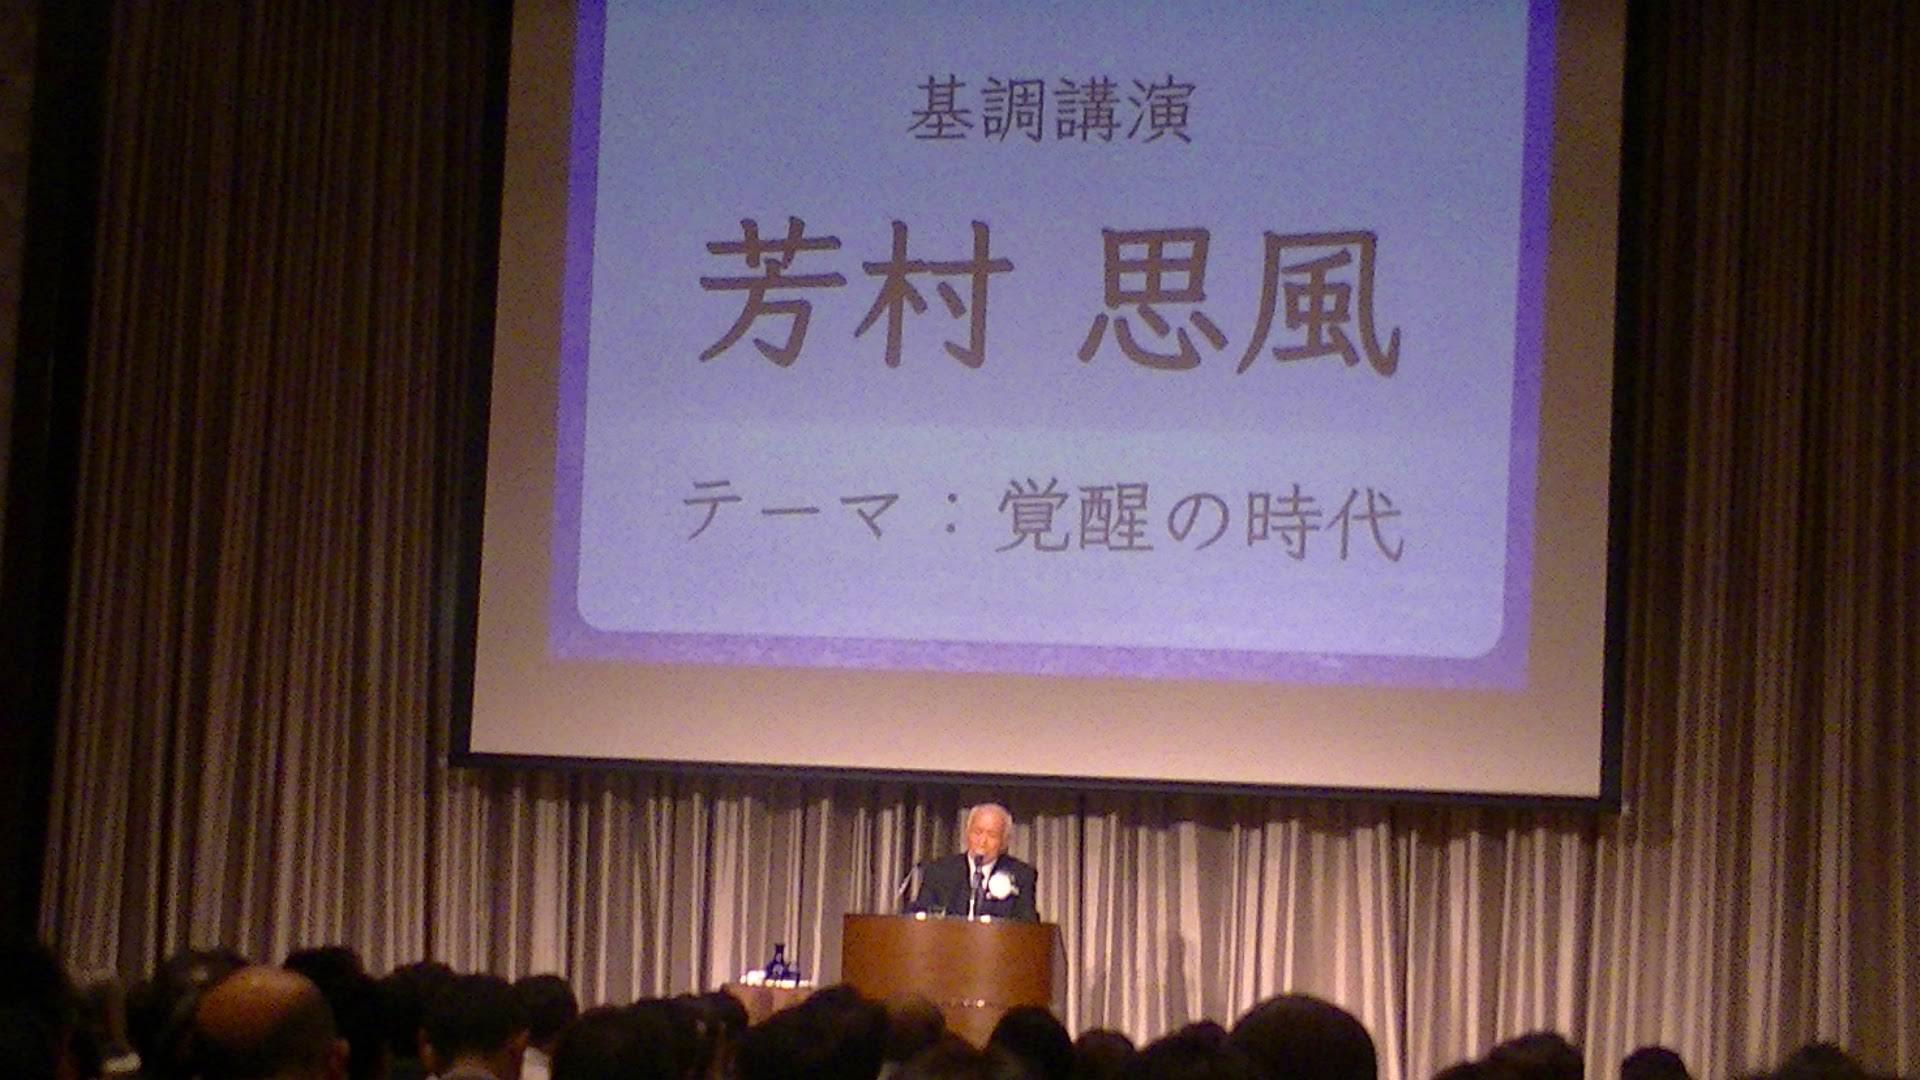 PIC 1724 1 - 思風会全国大会in広島